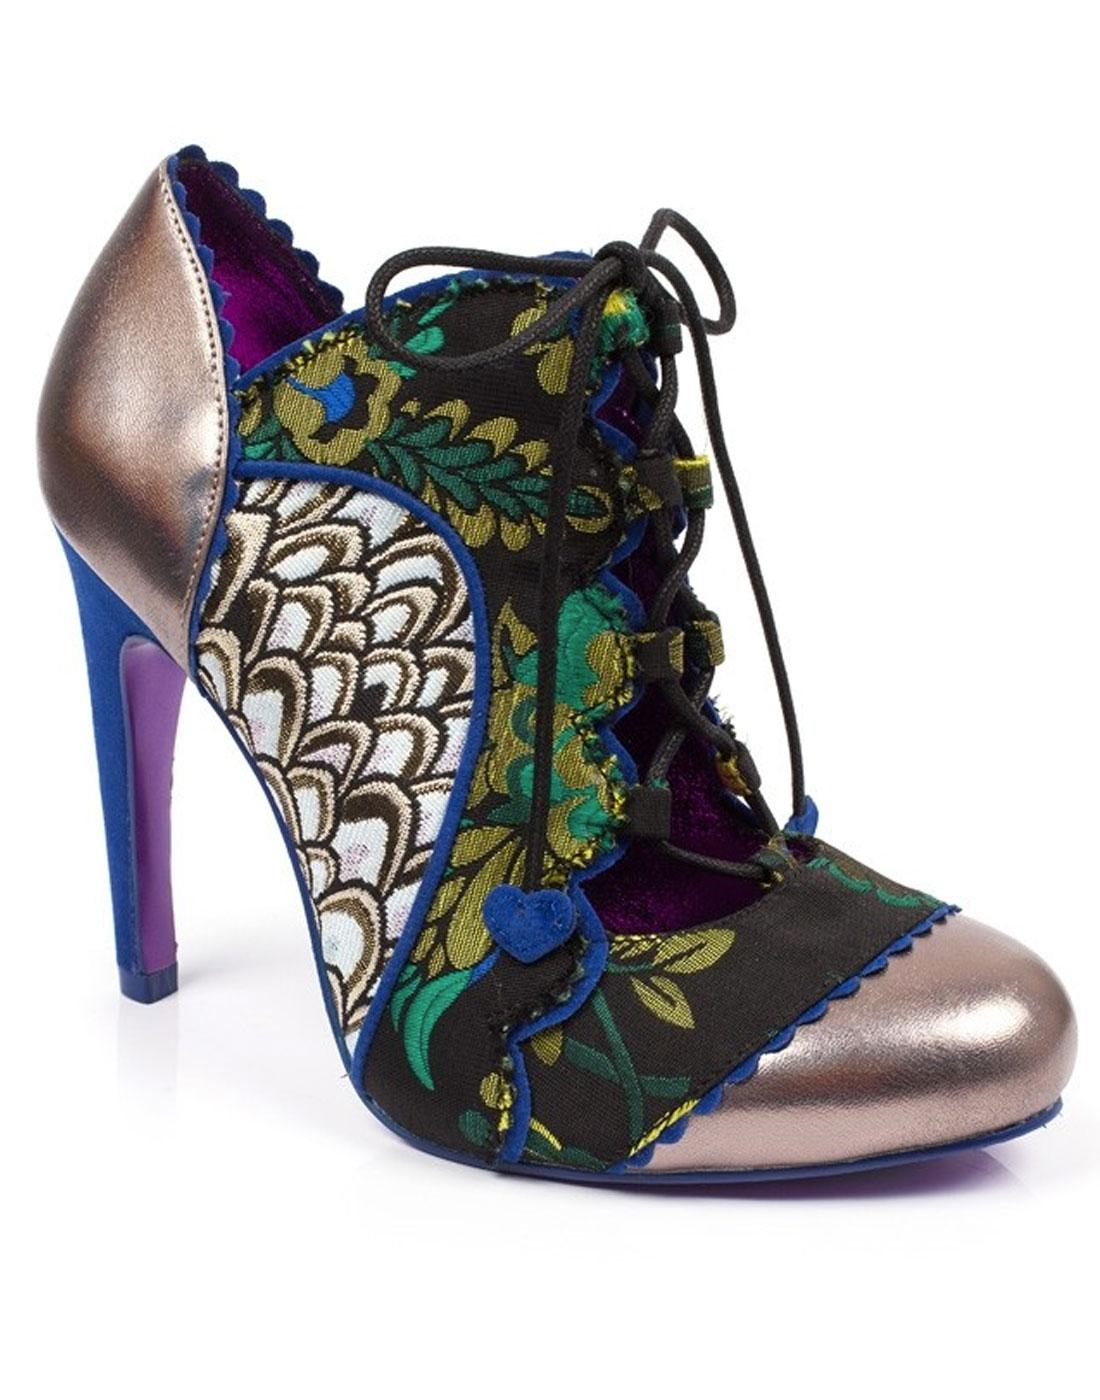 Halston POETIC LICENCE Open Front Floral Heels (G)